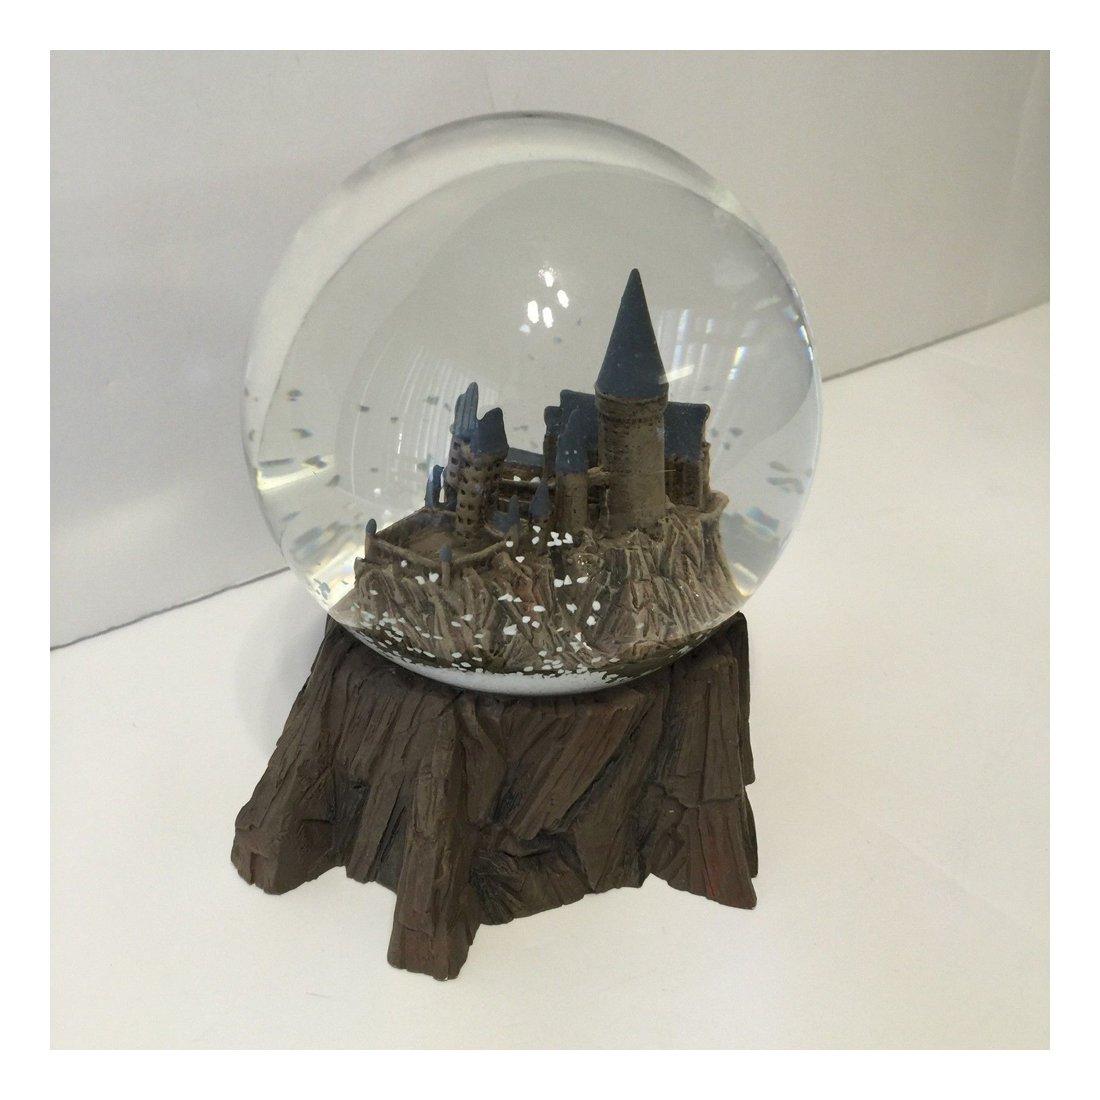 New Wizarding World Harry Potter Sculptured Castle Snow Globe Birthday Xmas Gift